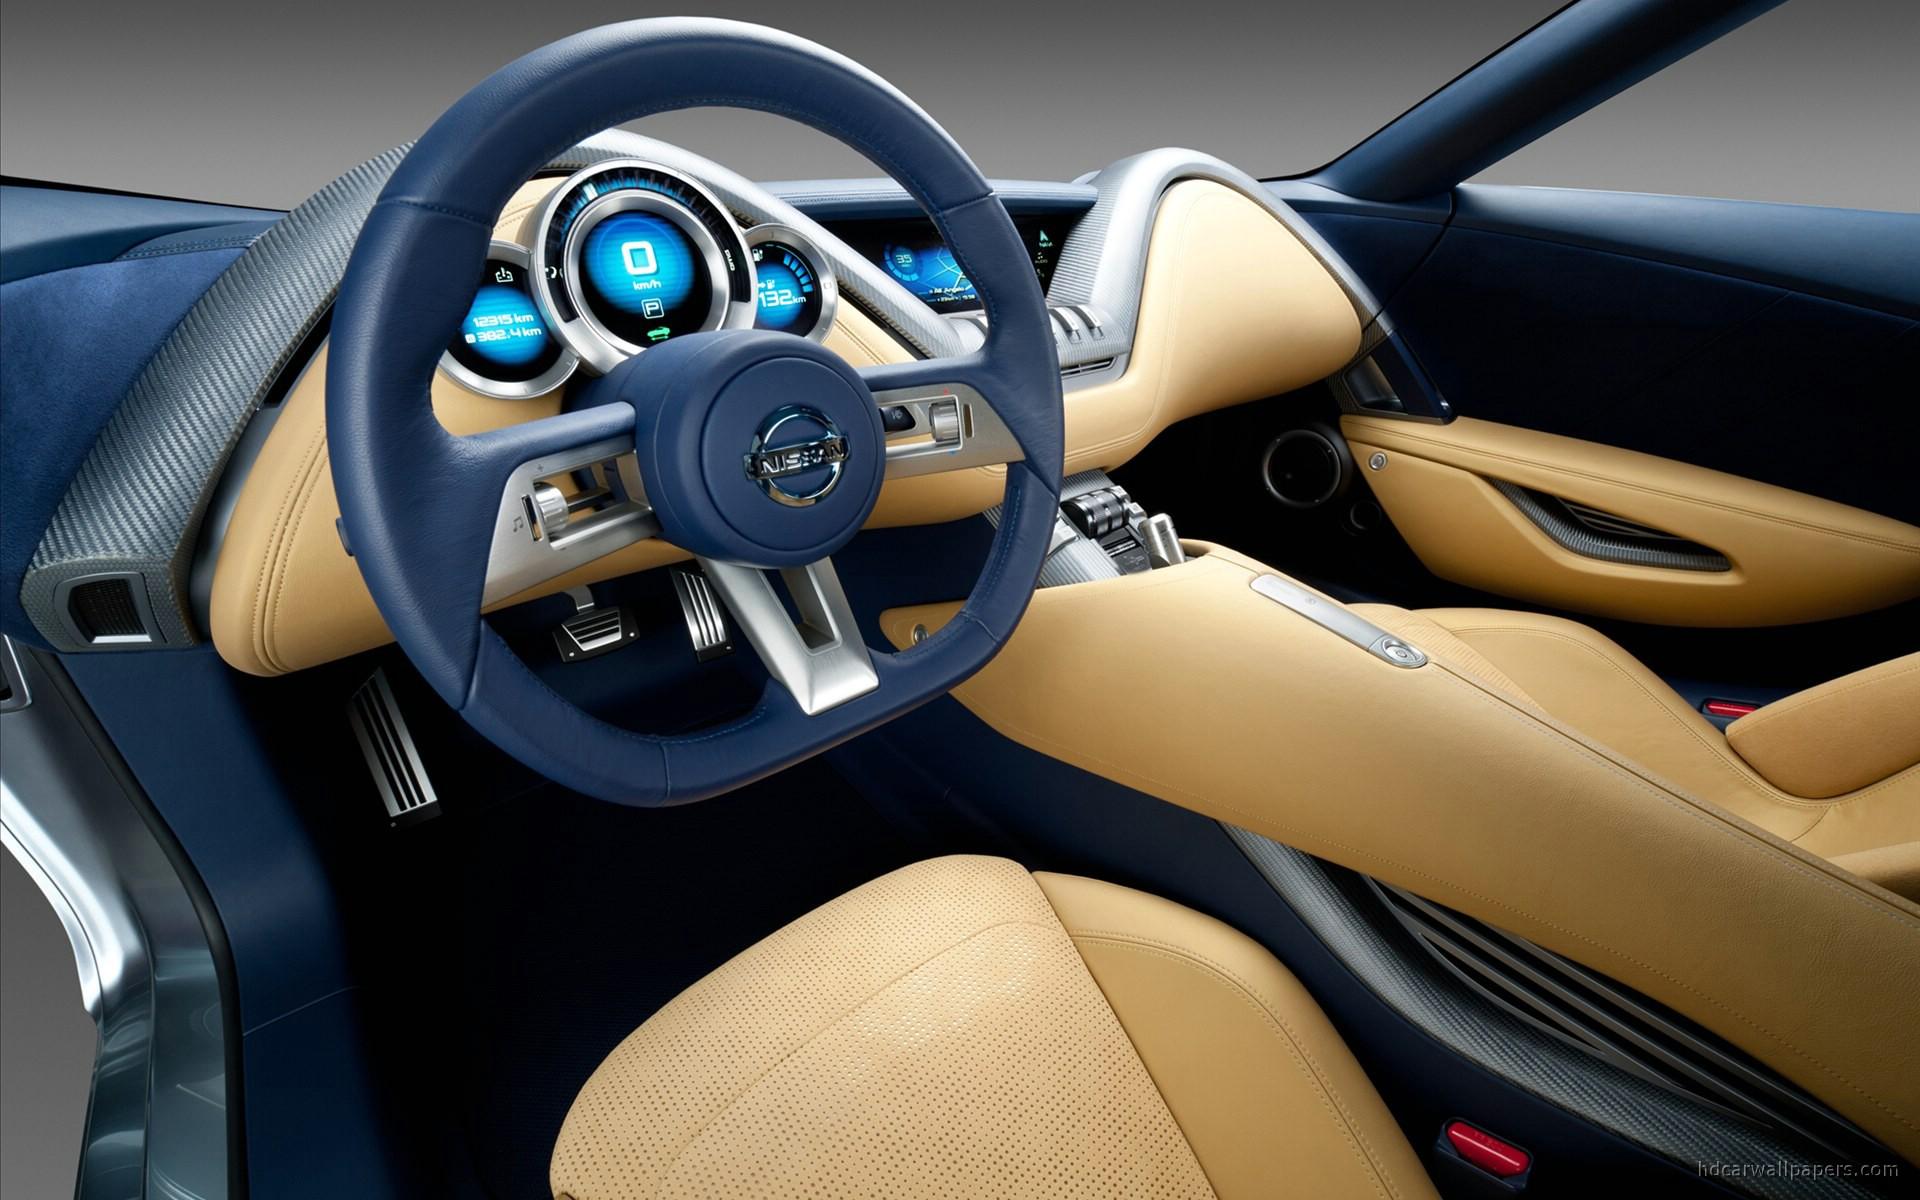 2011 Nissan Electric Sports Concept Car Interior Wallpaper